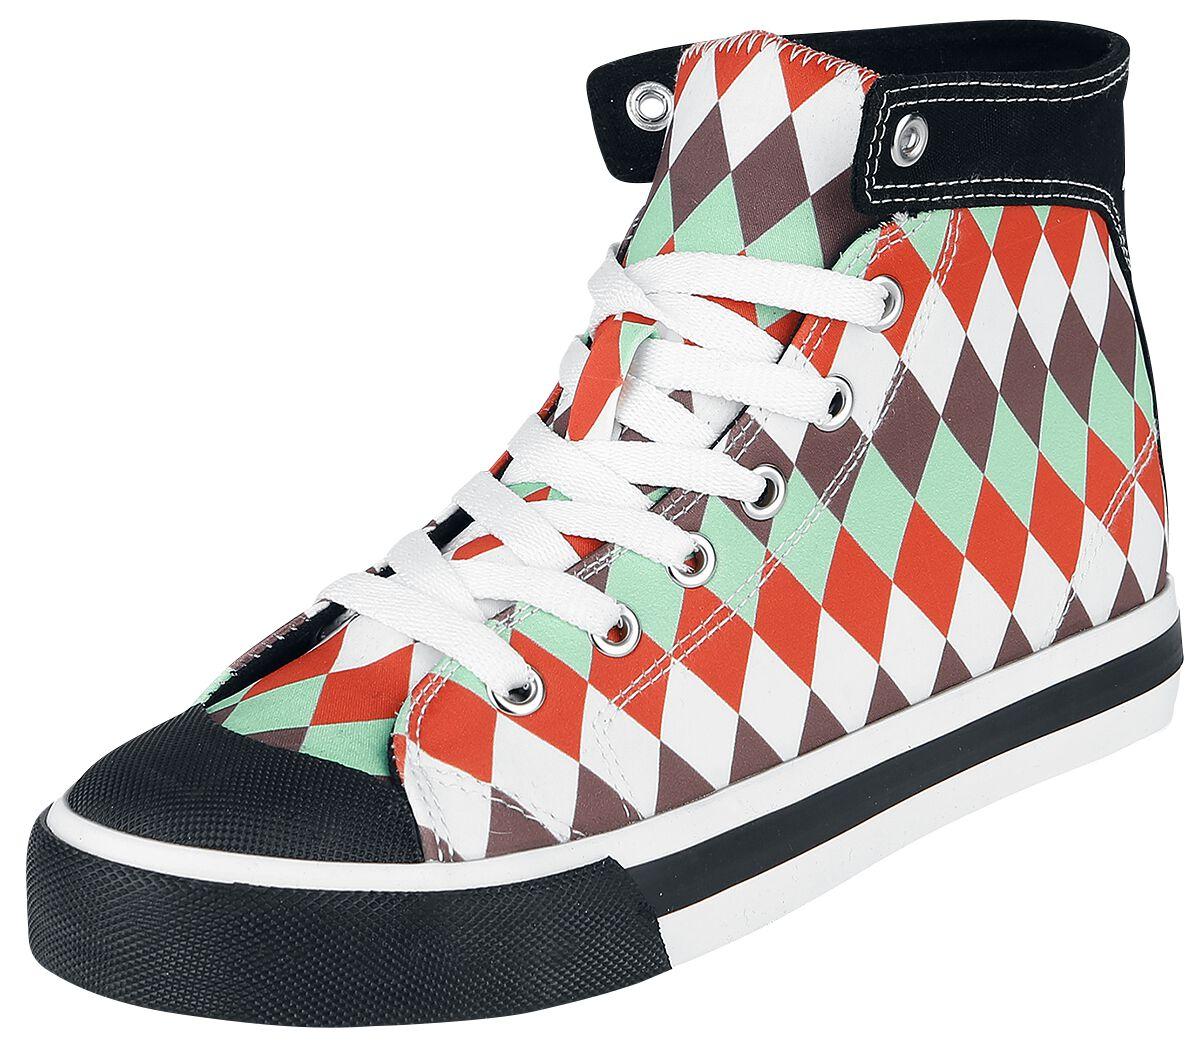 Sneakers für Frauen - Pussy Deluxe Sweet Diamonds Sneaker Sneaker multicolor  - Onlineshop EMP